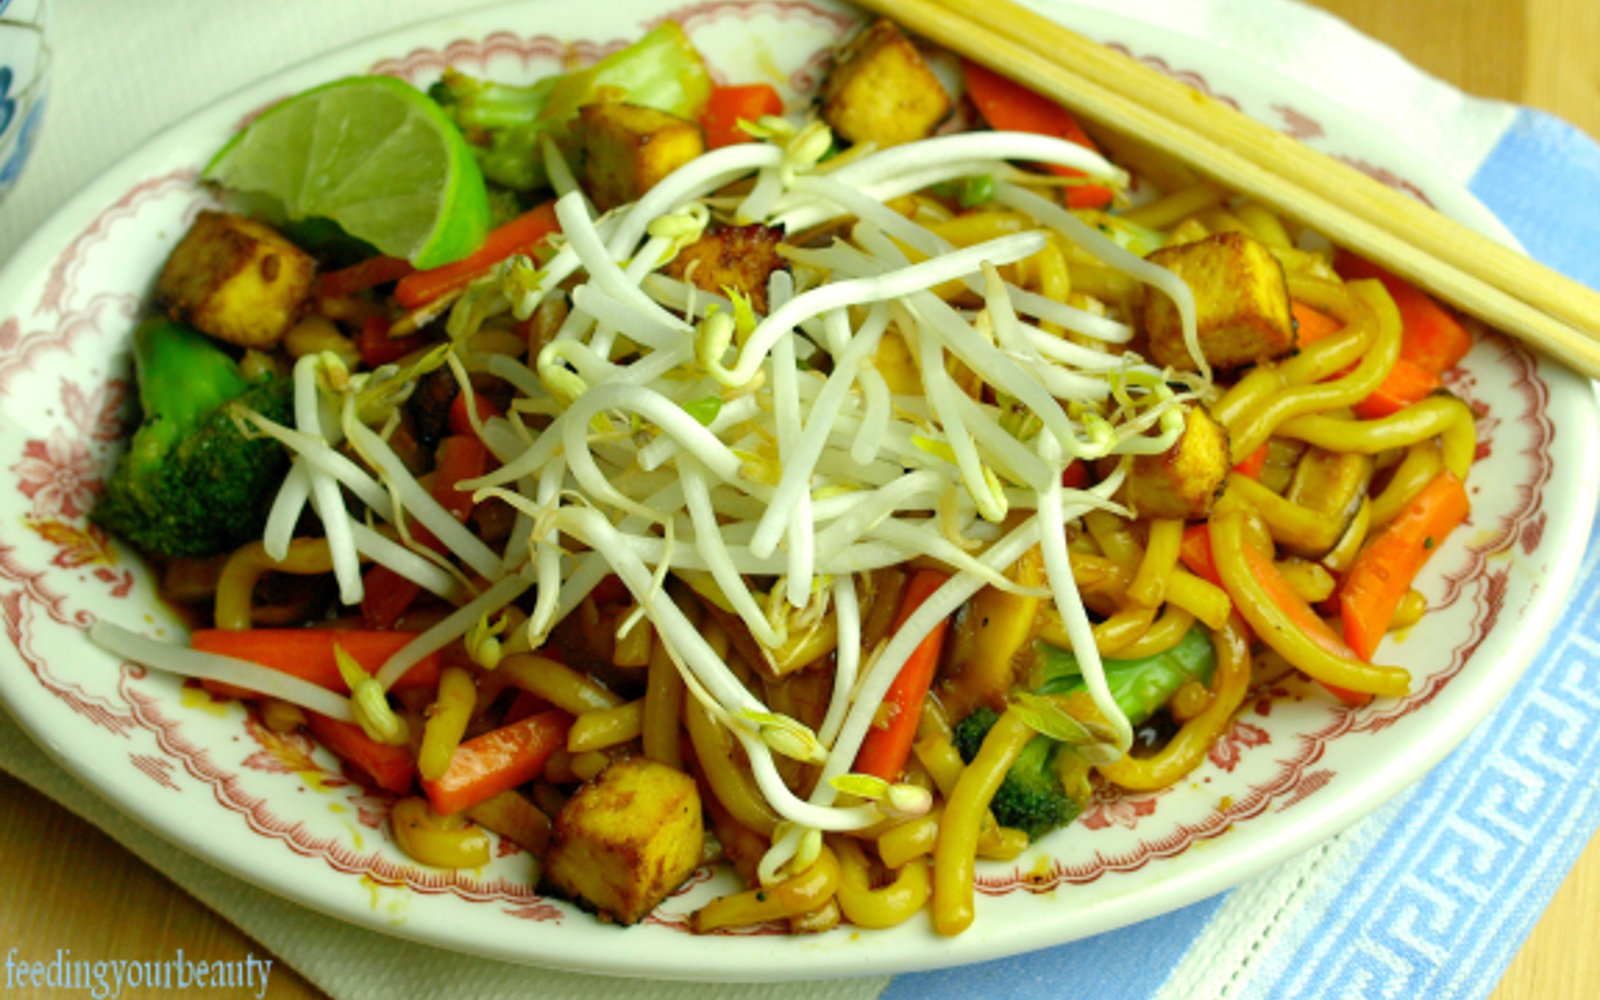 Japanese Pan Noodles With Healthier Homemade Teriyaki Sauce